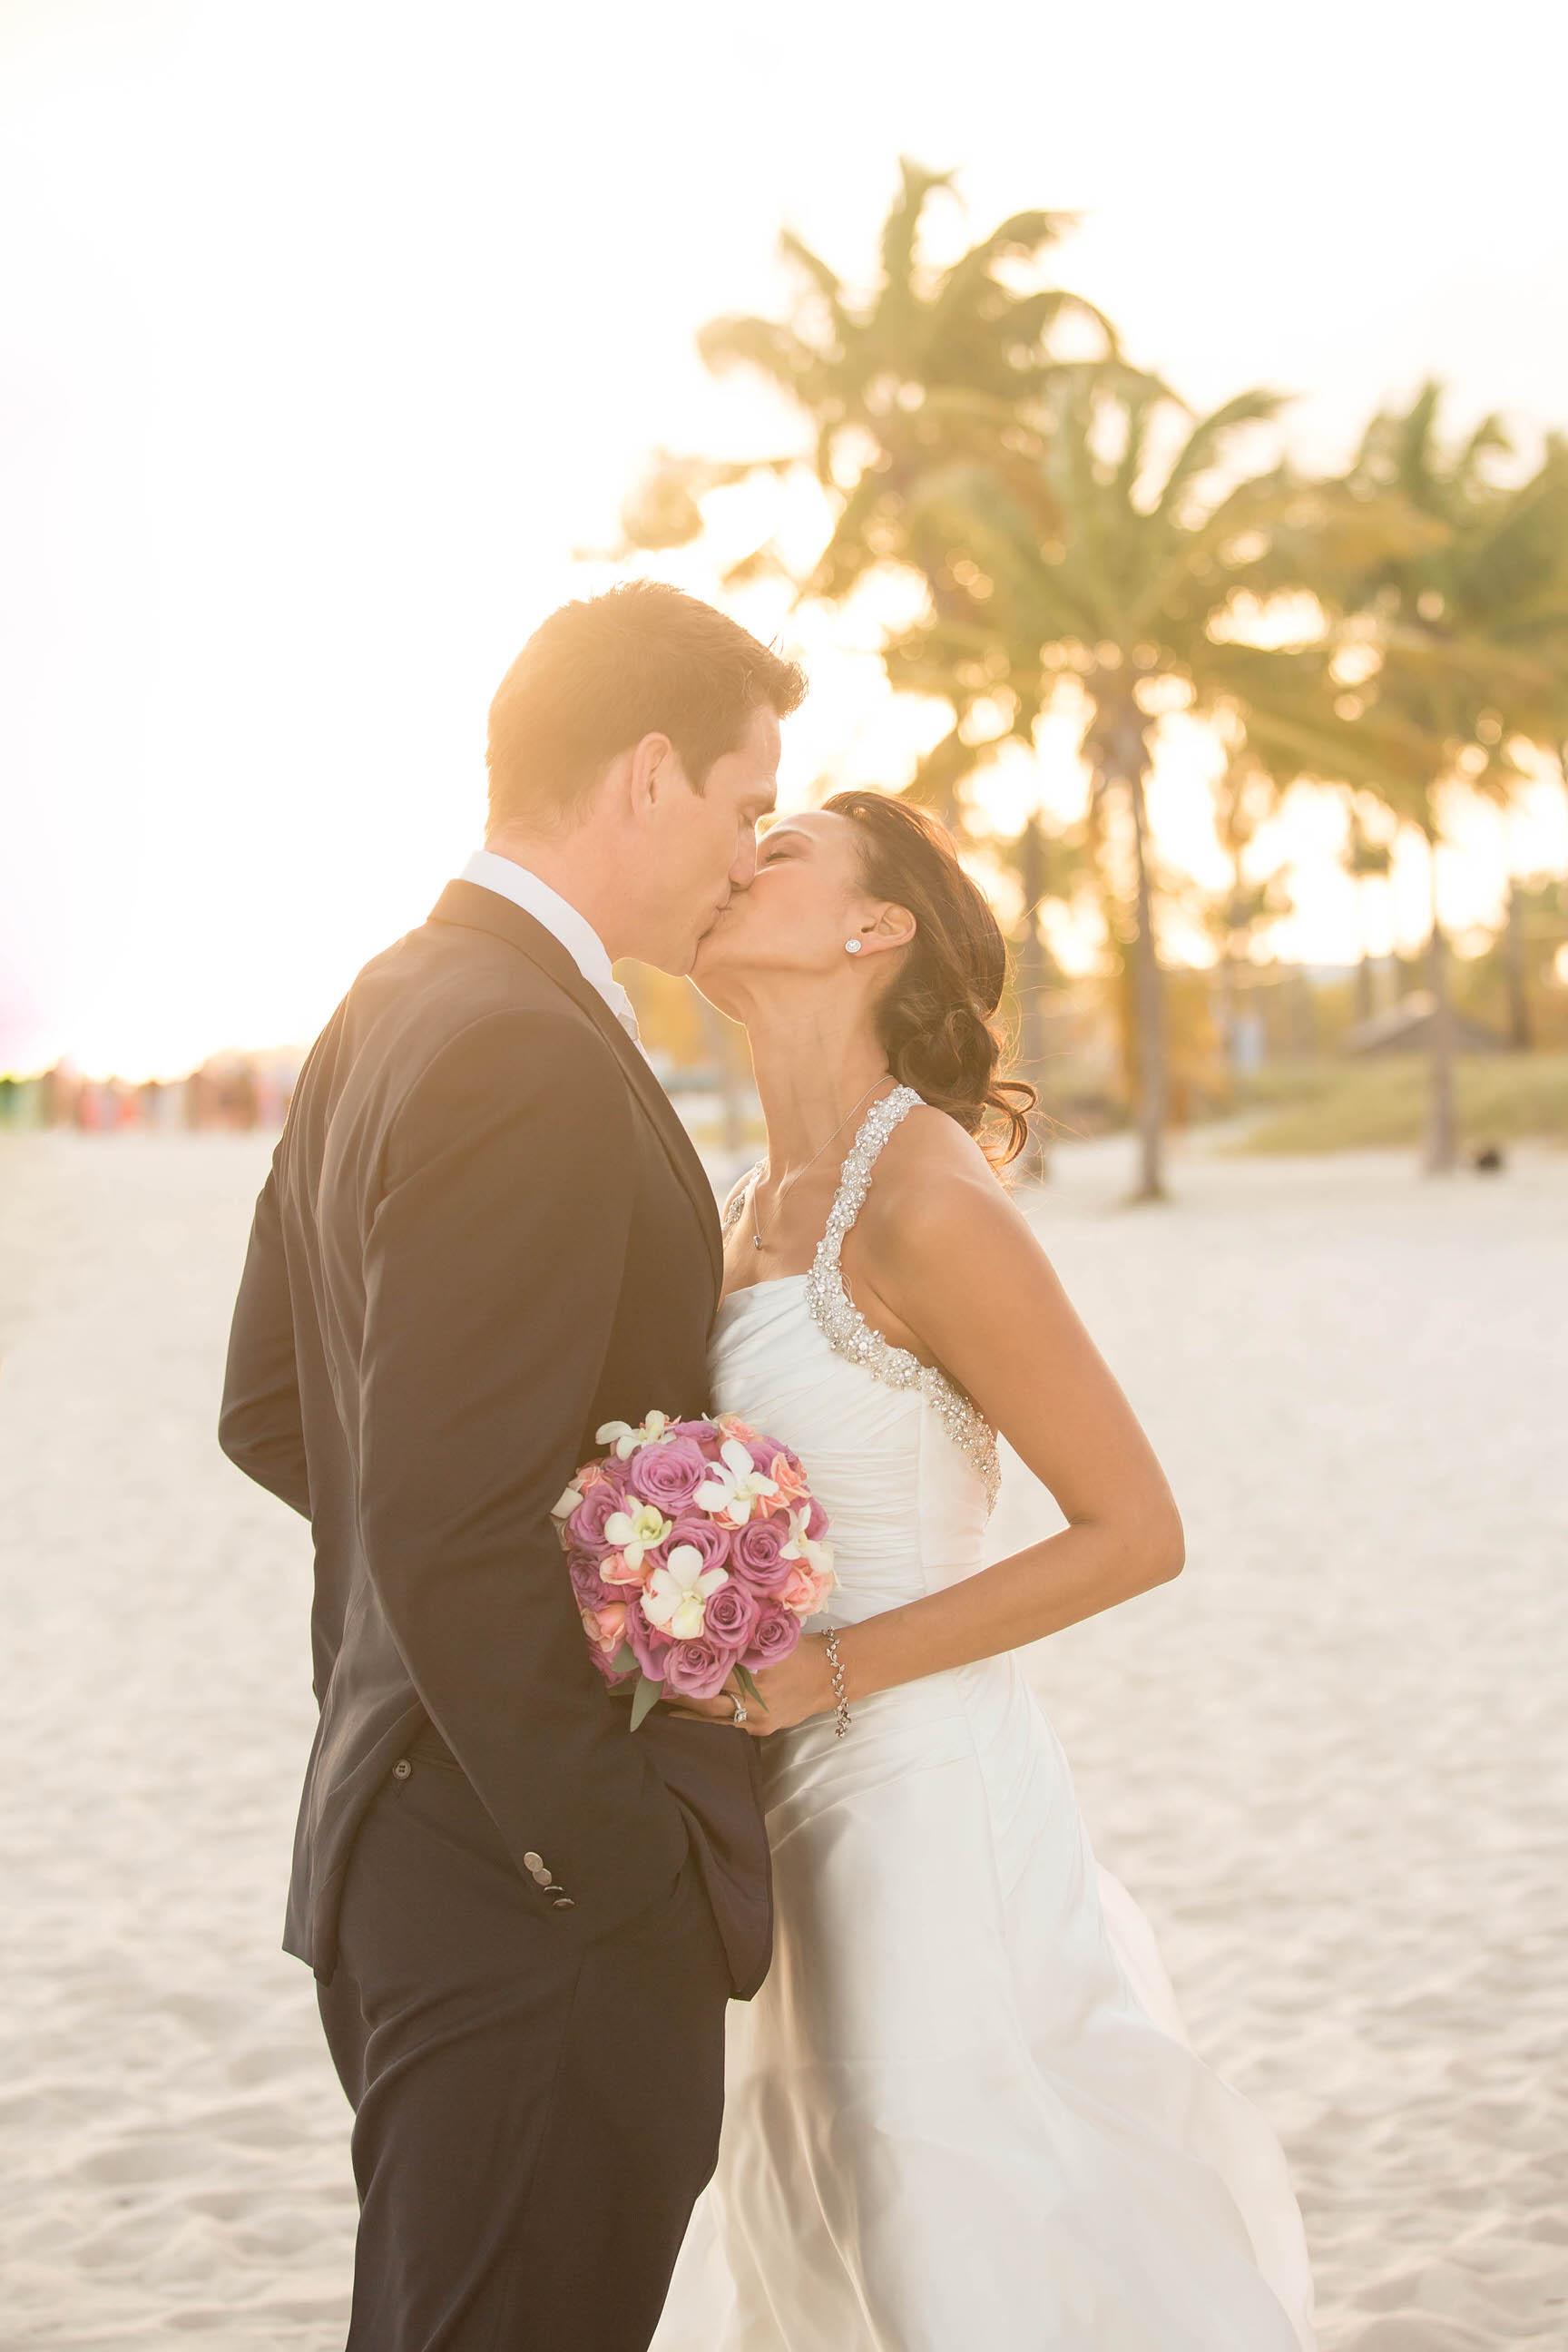 sunset_golen_beach_vibes_wedding_photography_tiny_house_photo.jpg